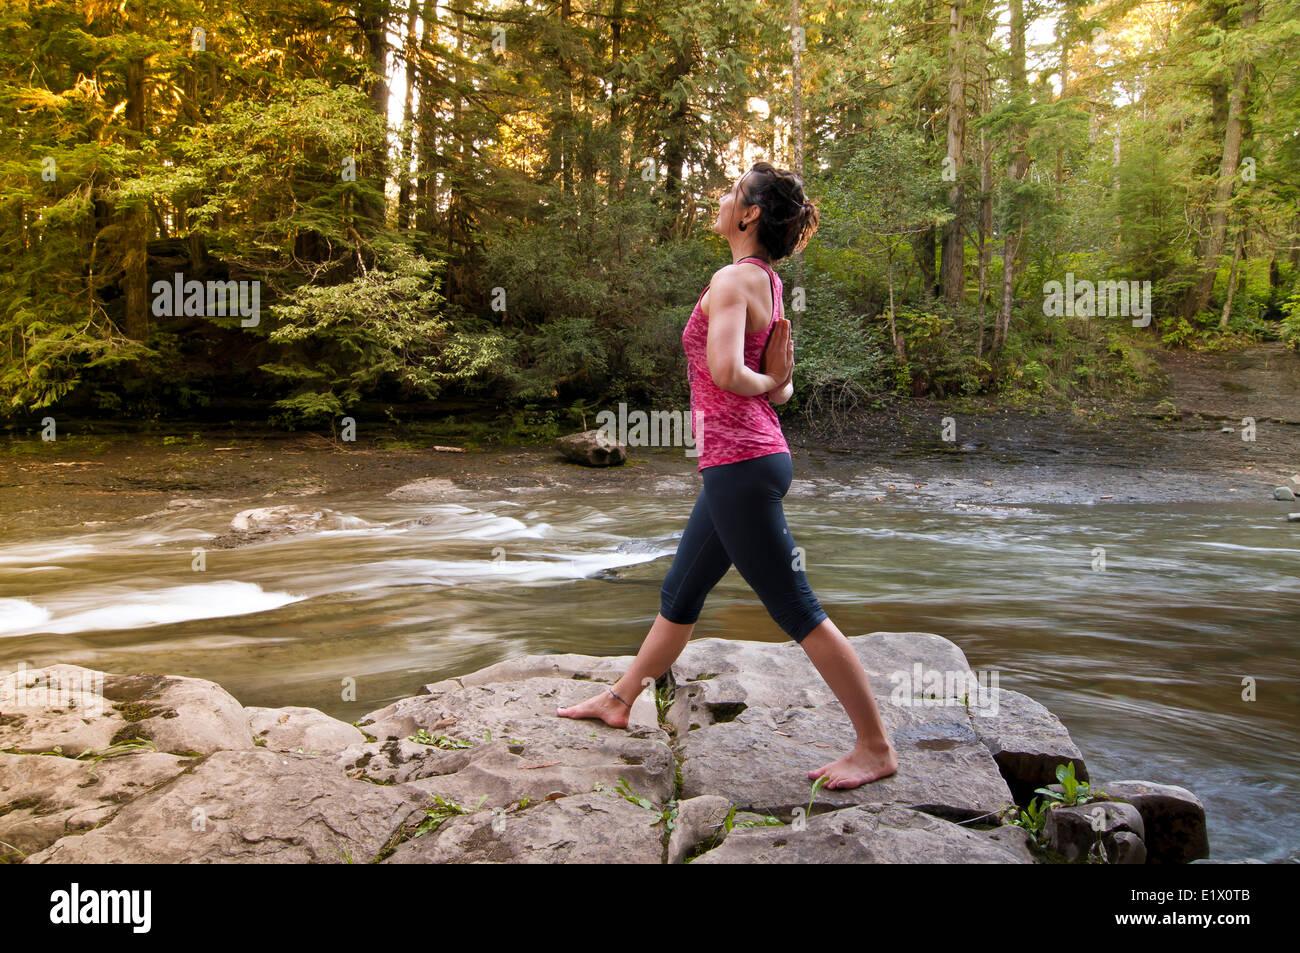 A woman hodling a reverse prayer yoga pose, Courtenay British Columbia, Canada - Stock Image